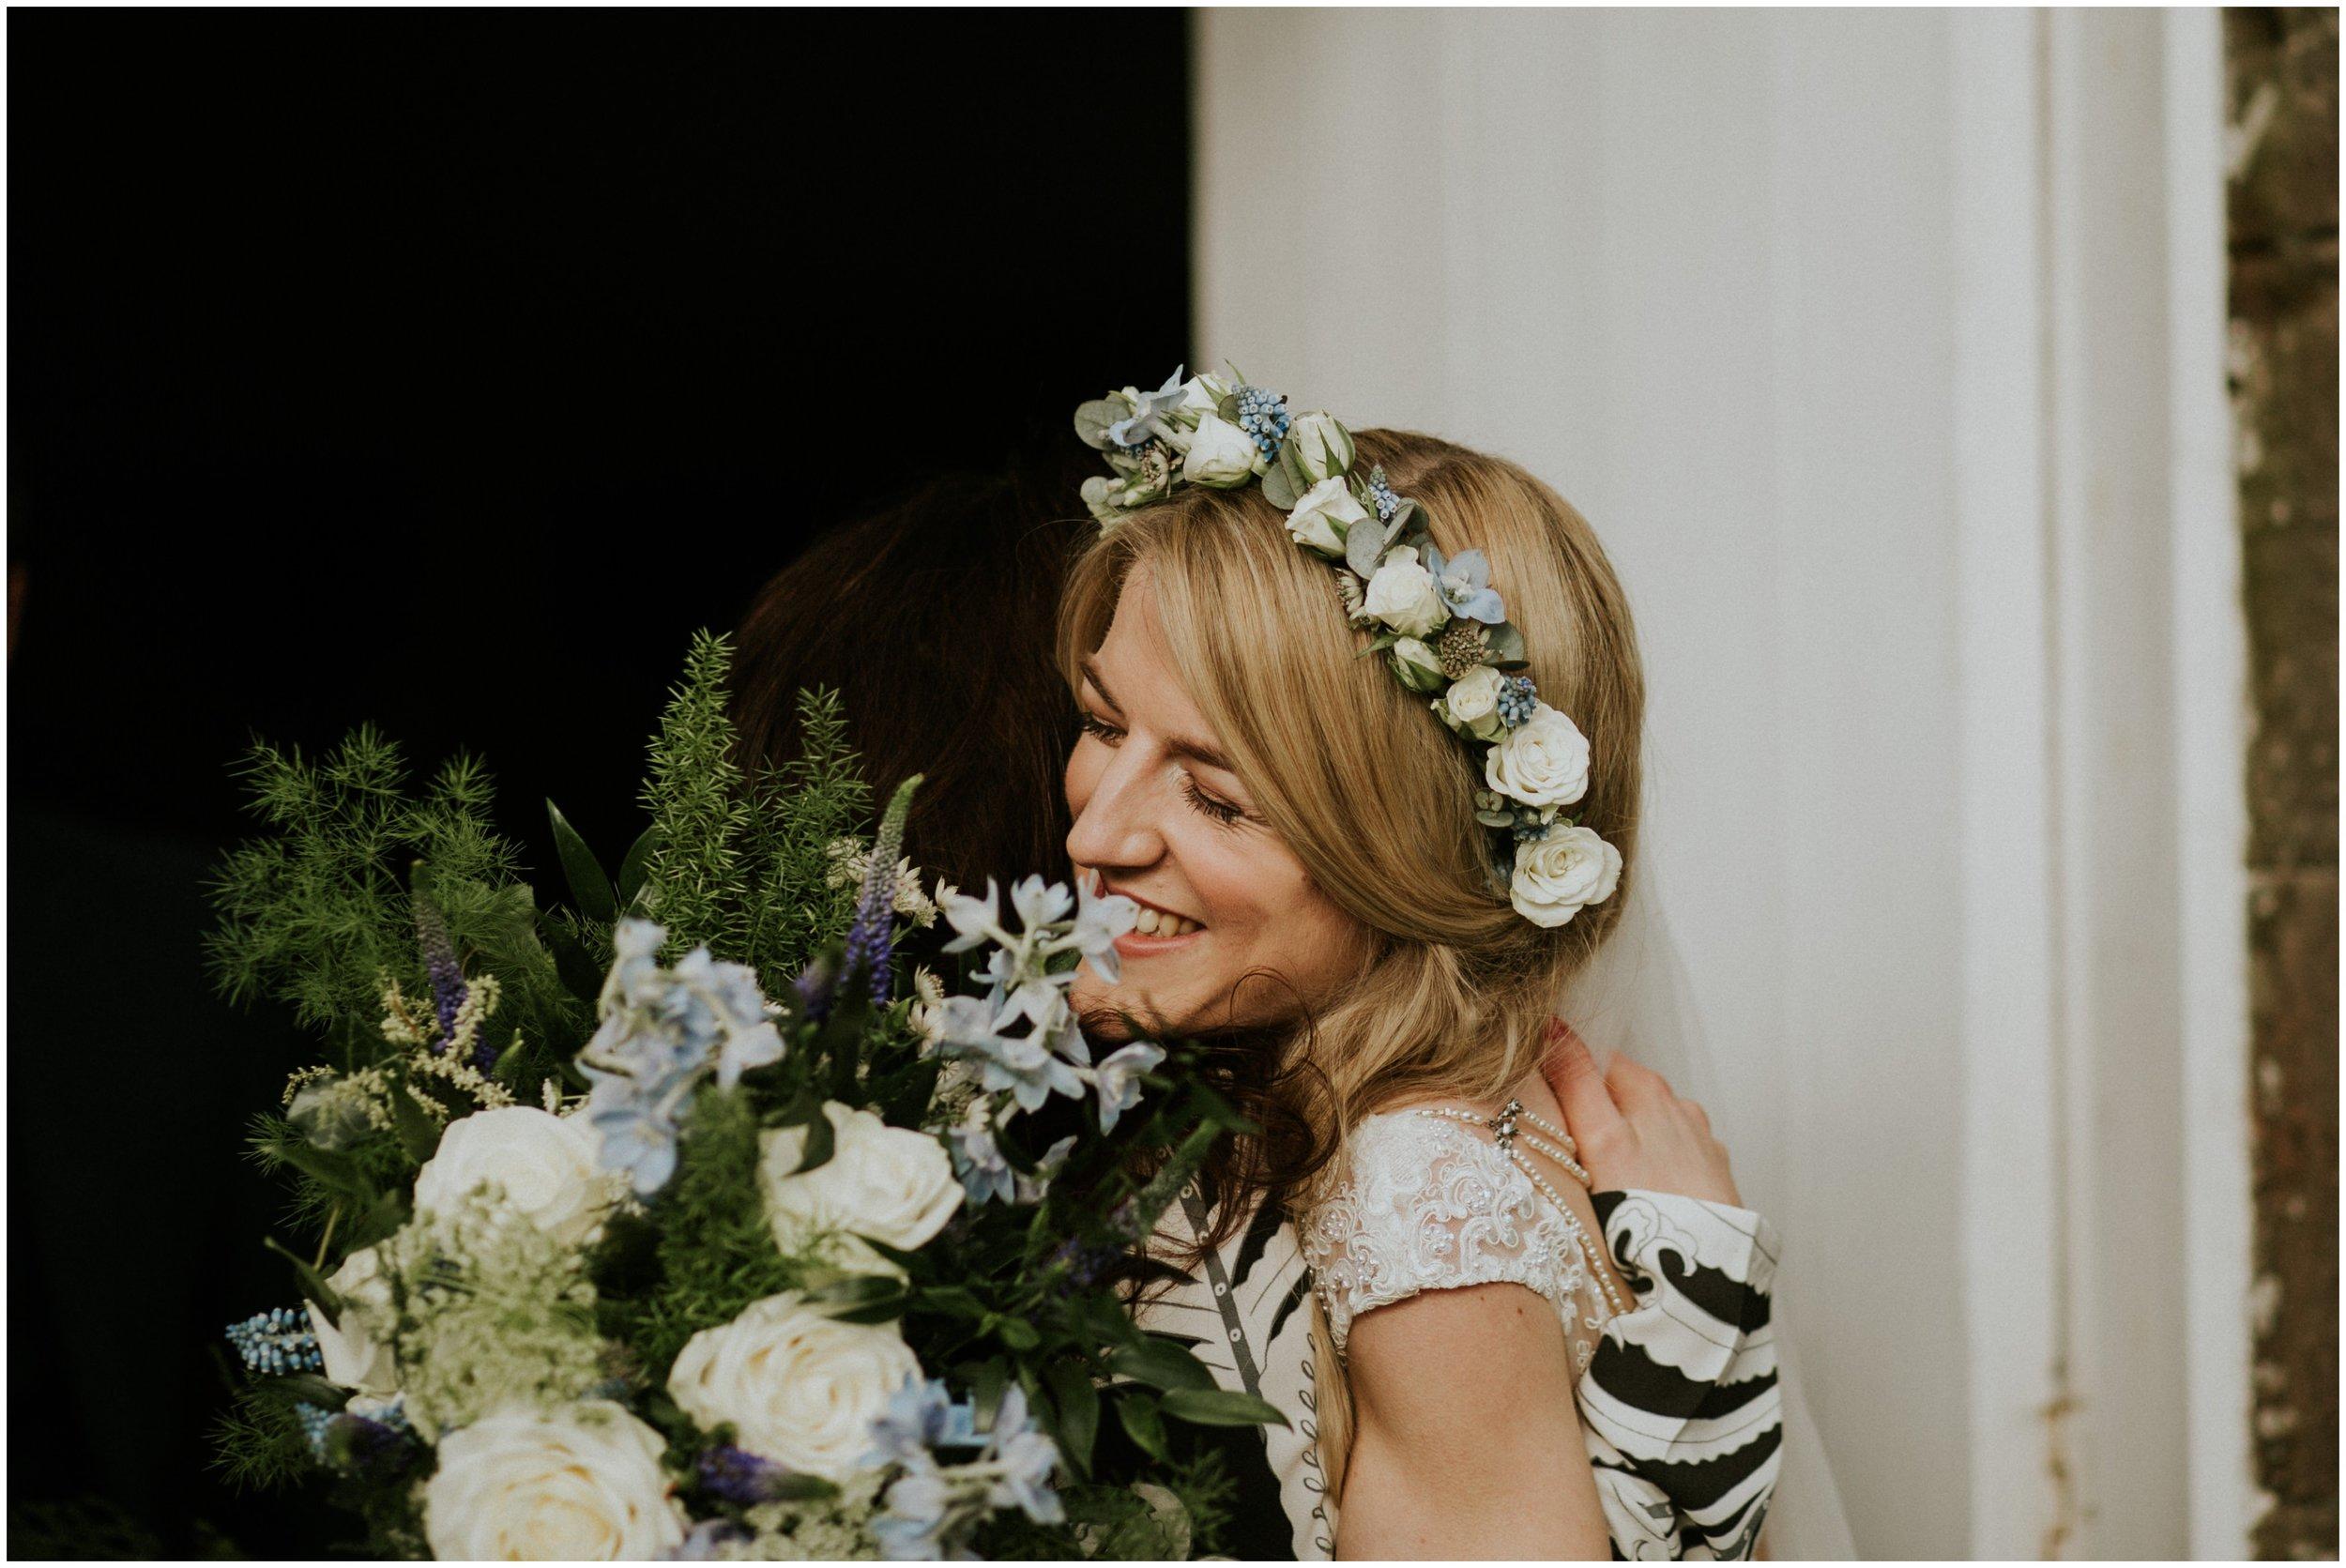 Photography 78 - Glasgow Wedding Photographer - Dave & Alana_0053.jpg